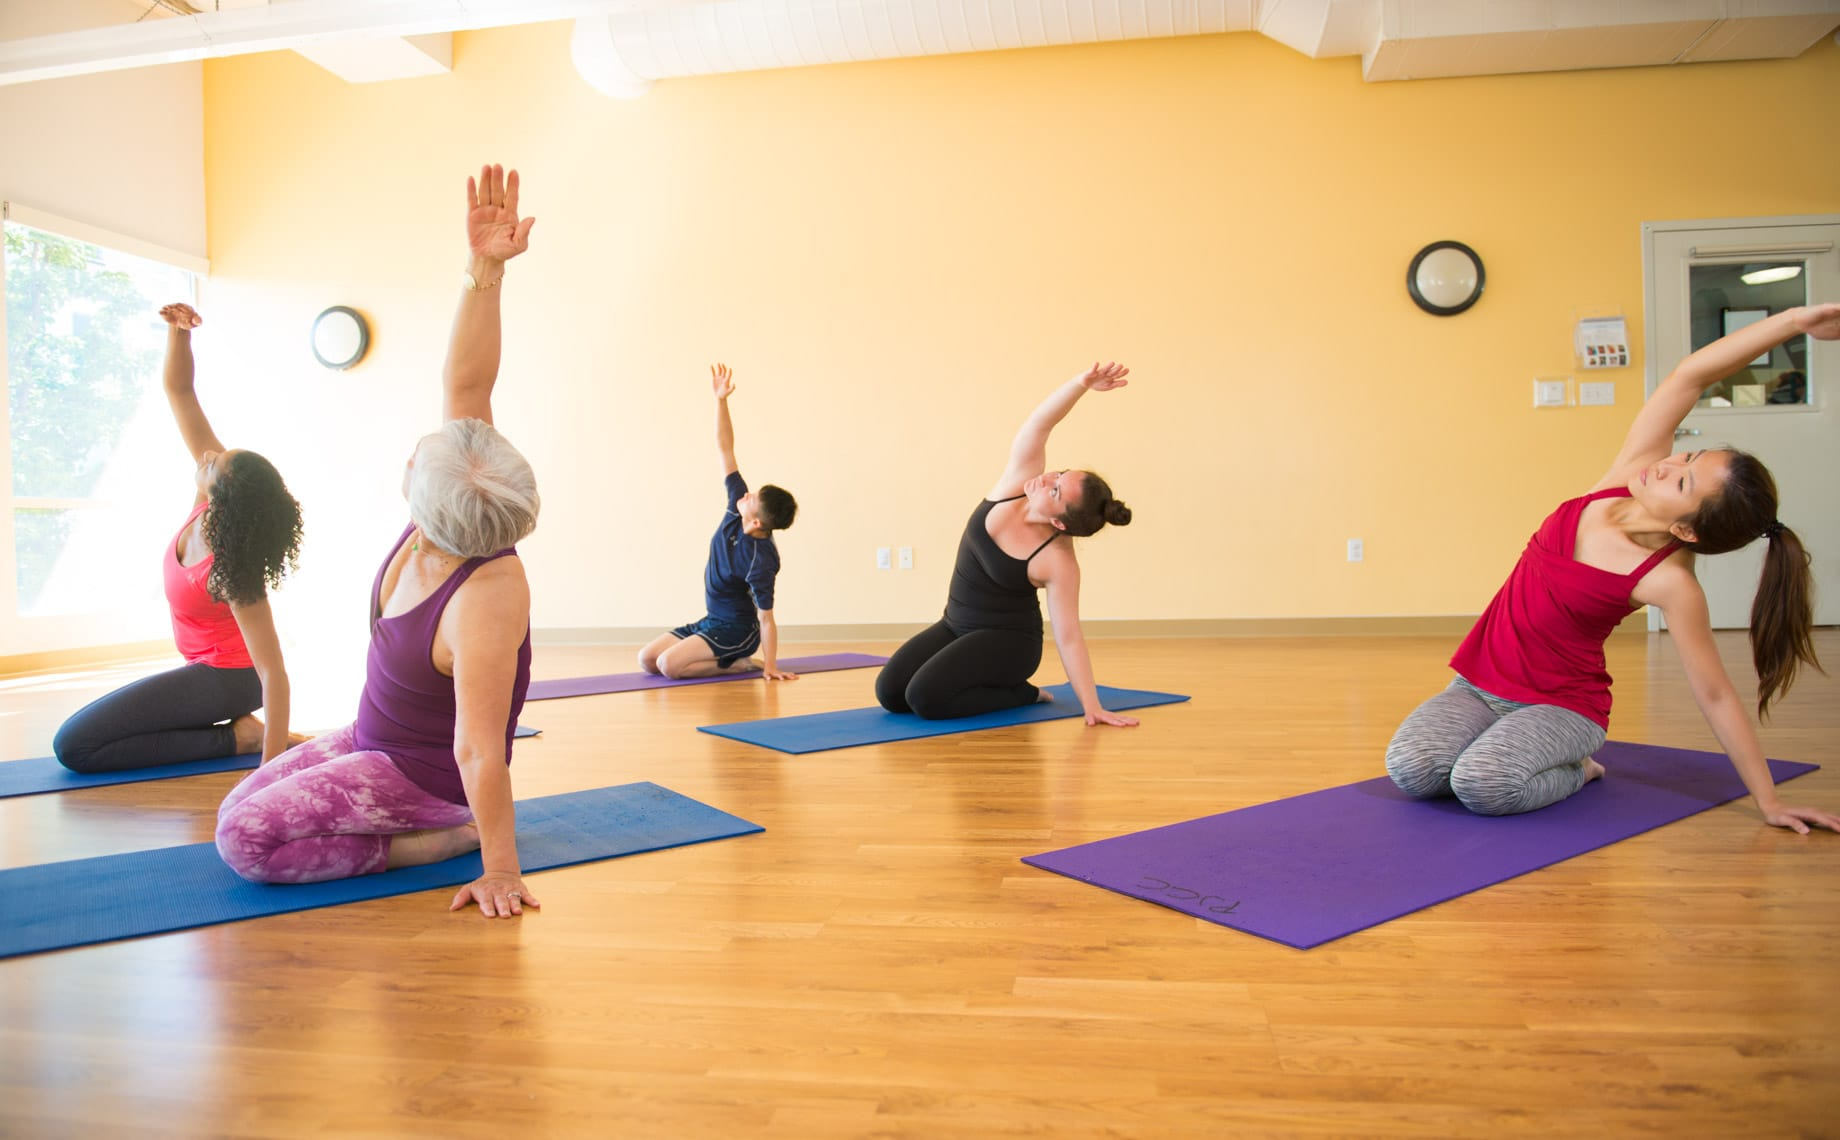 Yoga students stretching on mats at the PJCC yoga studio